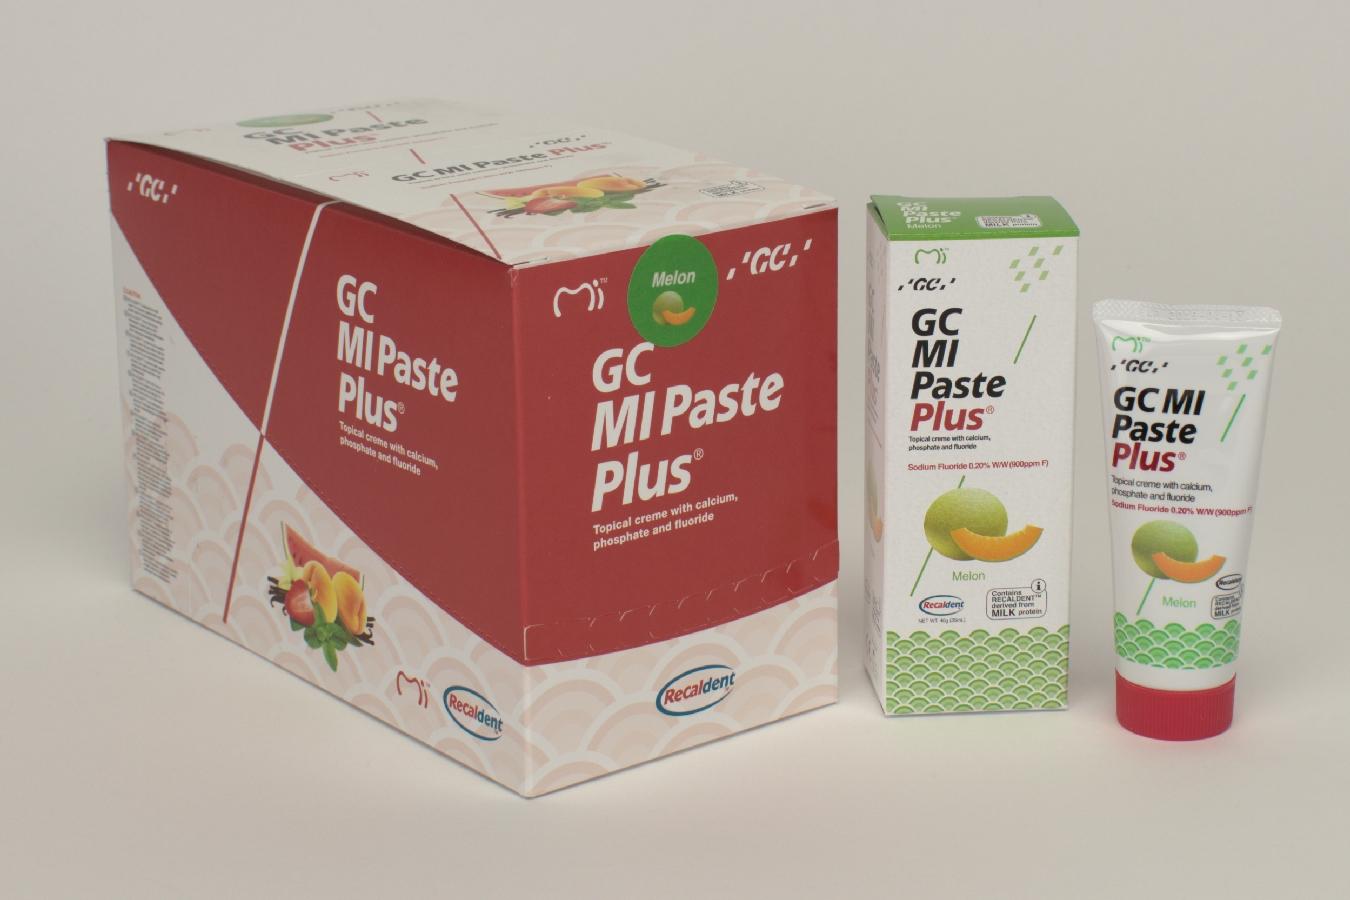 MI Paste Plus Melone 10x40g Tb